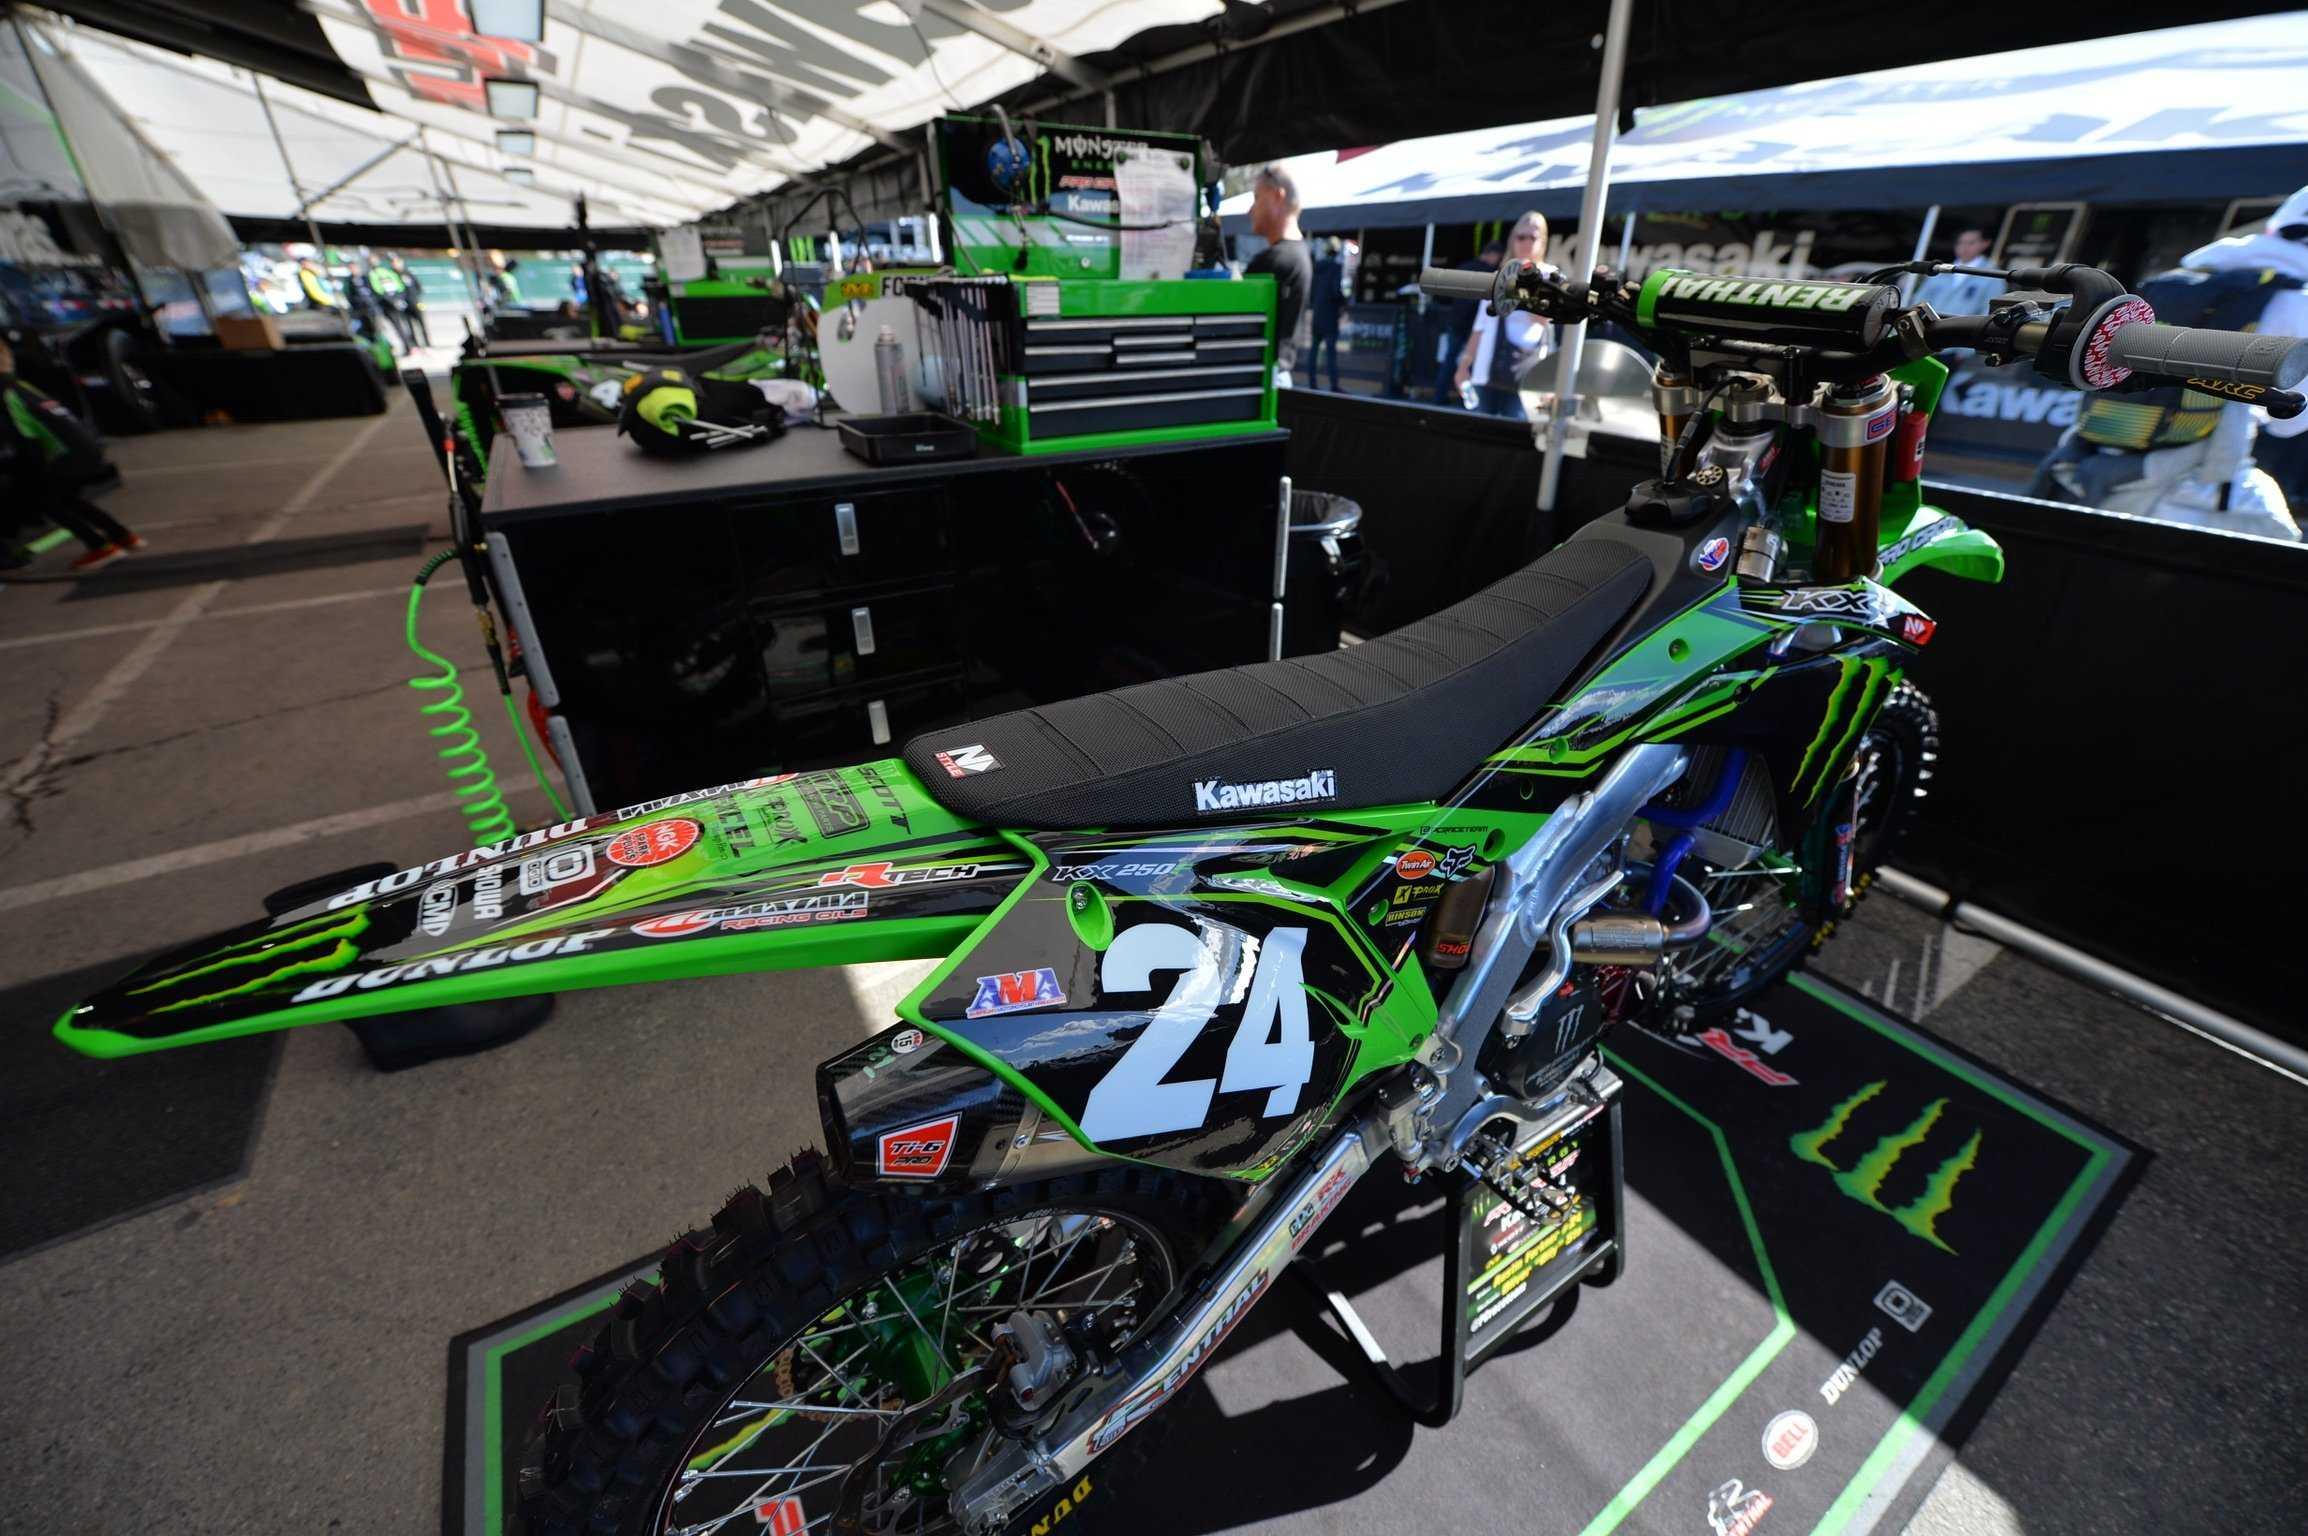 Monster Energy Pro Circuit Kawasaki 2017 Motocross Season Wrap-Up